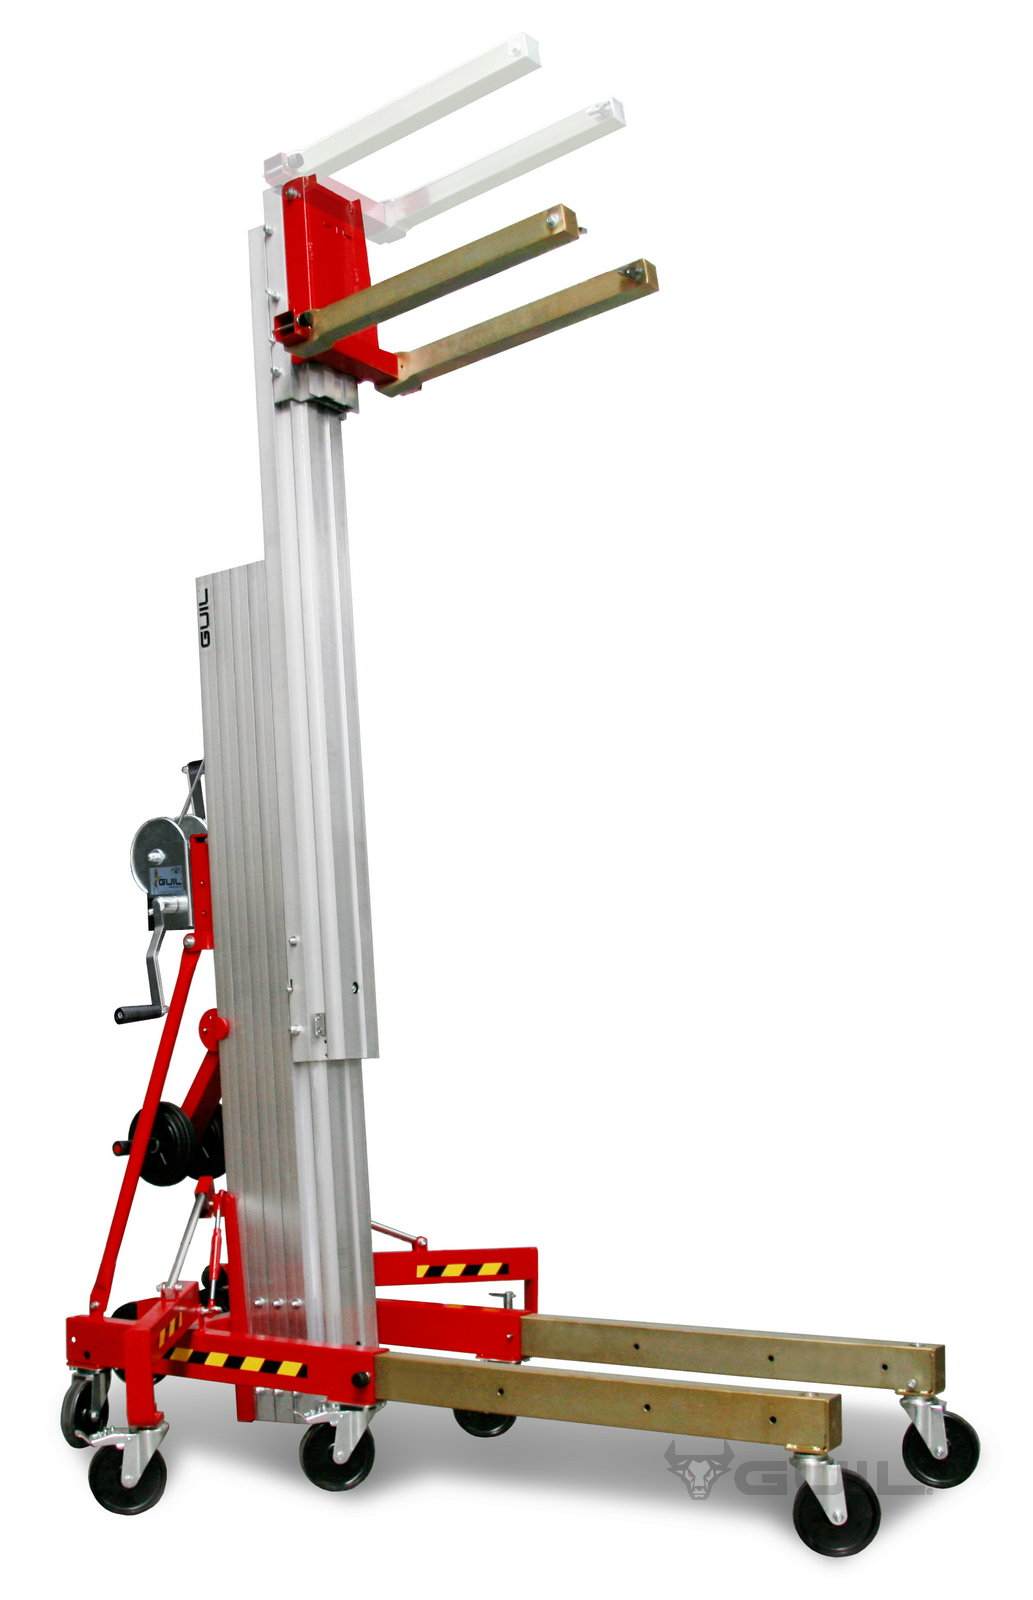 Kanaallift 6,5 m 400 kg (dutch) (4)